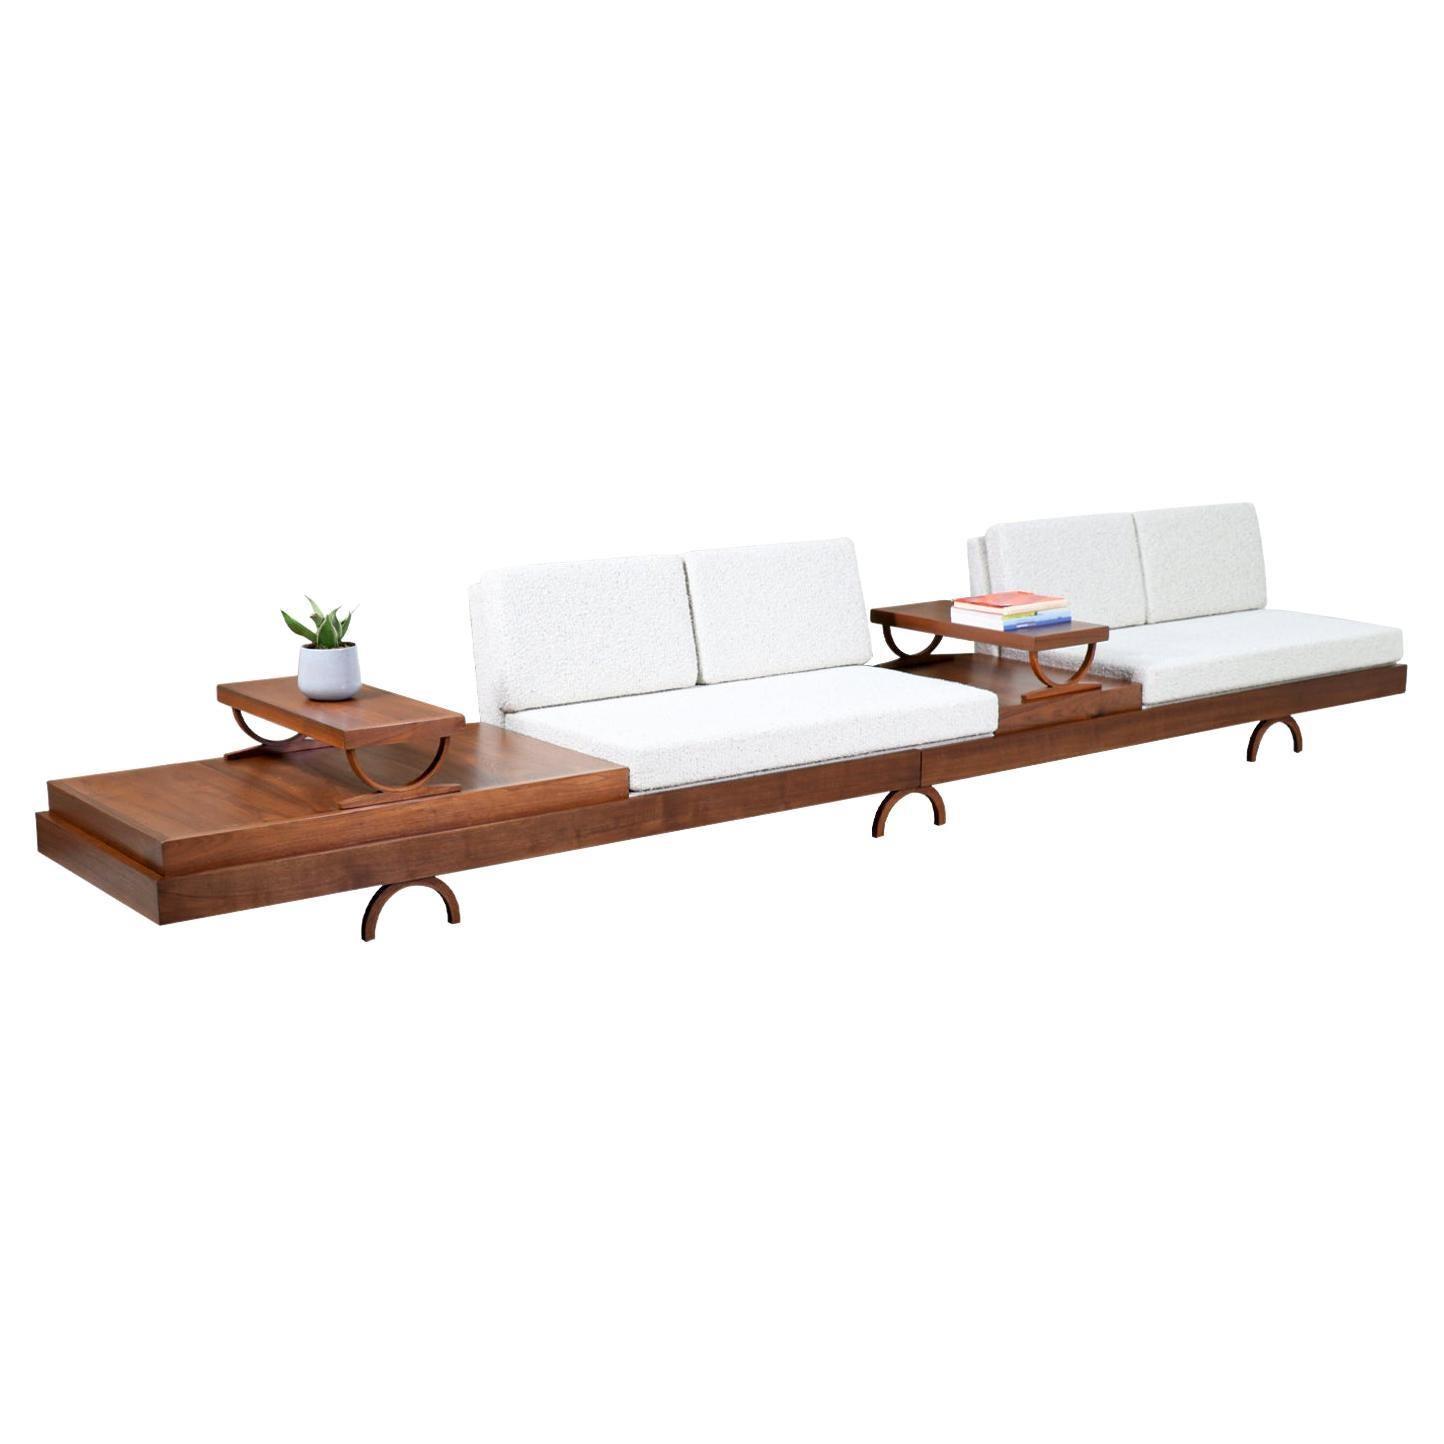 Mid-Century Modern Low-Profile Modular Sofa by Martin Borenstein